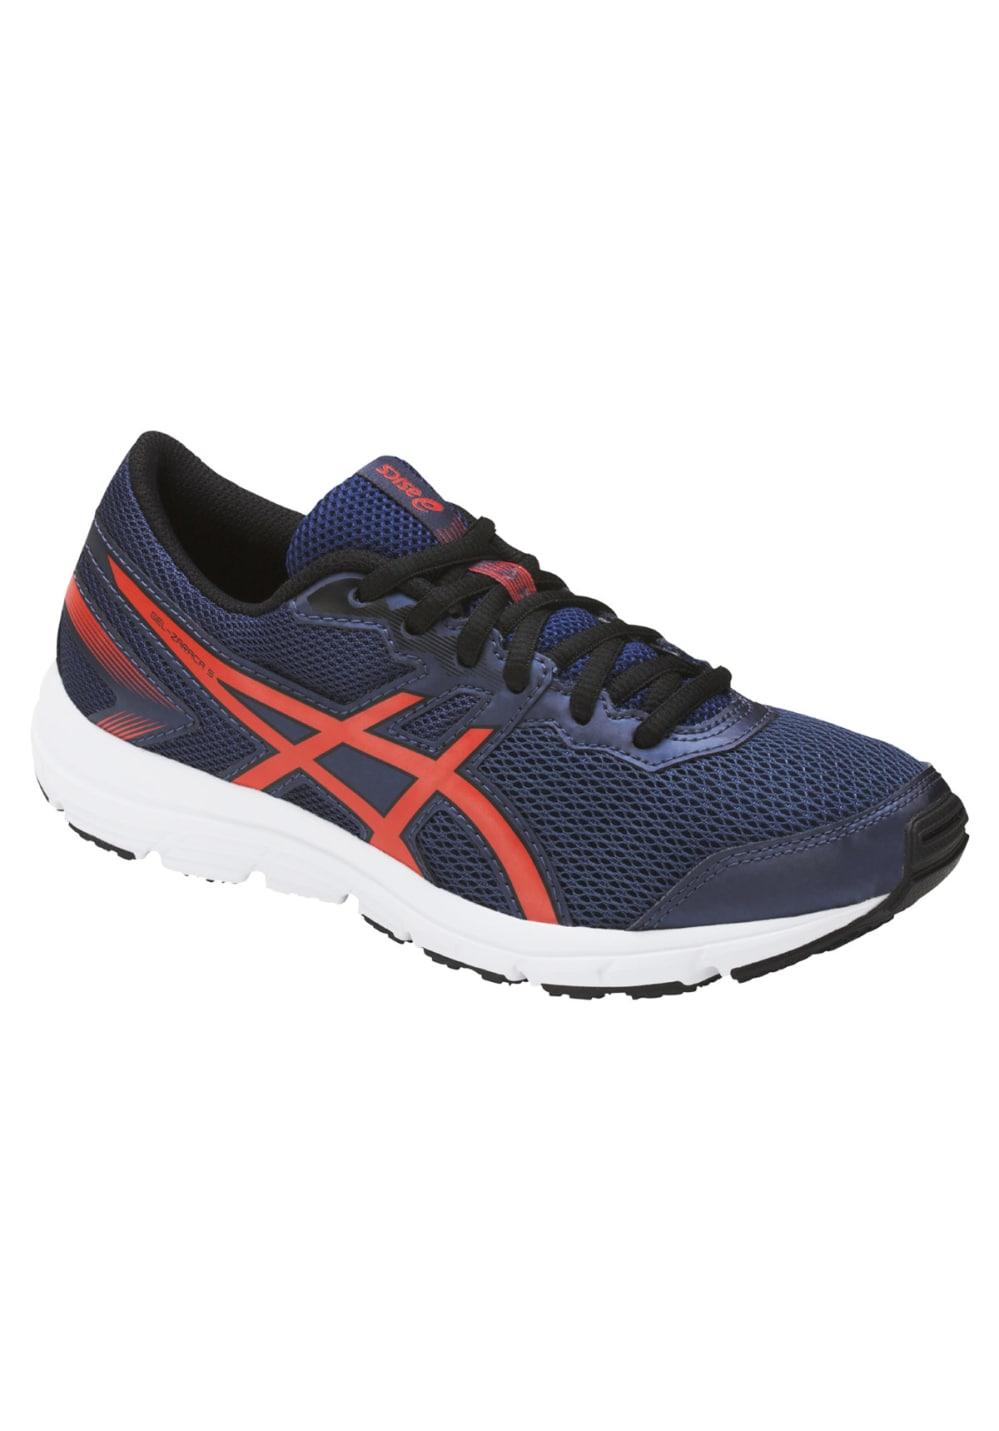 premium selection 73a32 b3166 ASICS GEL-Zaraca 5 GS - Running shoes - Purple